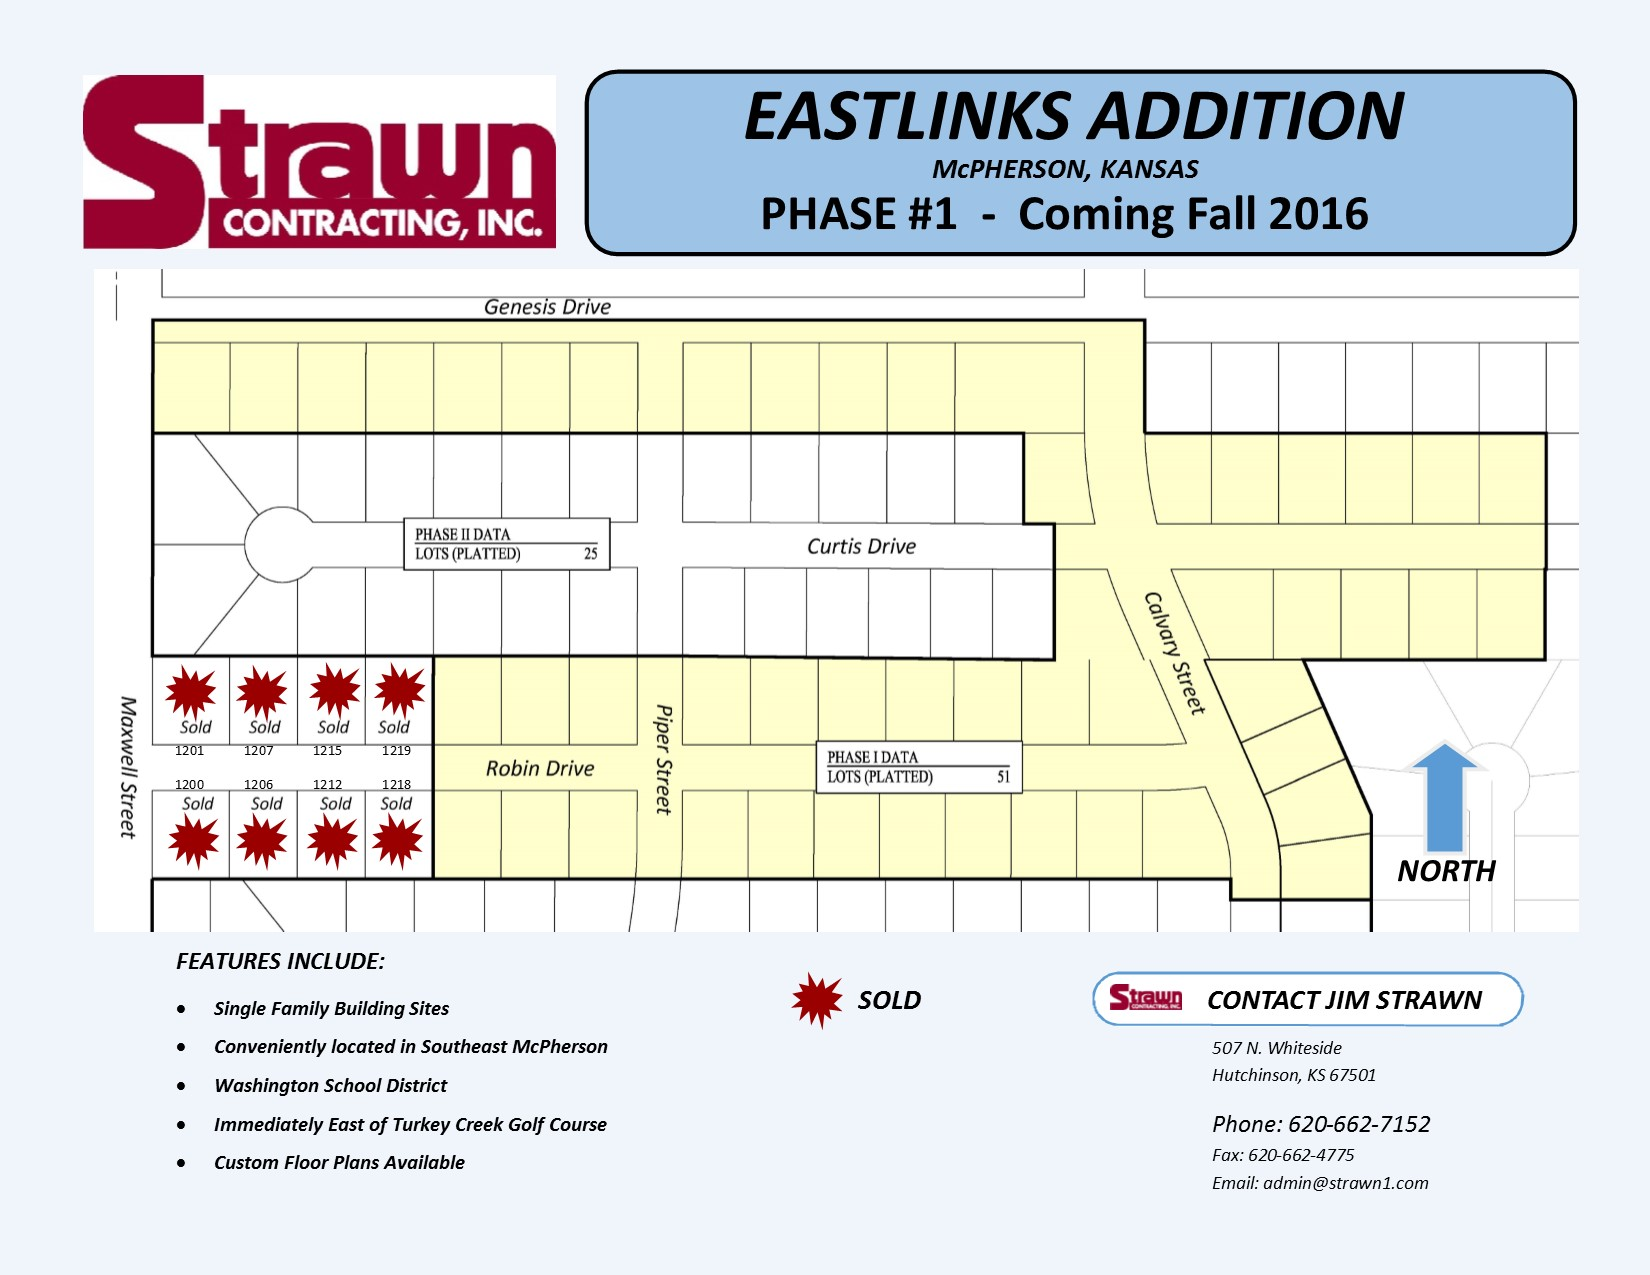 Eastlinks